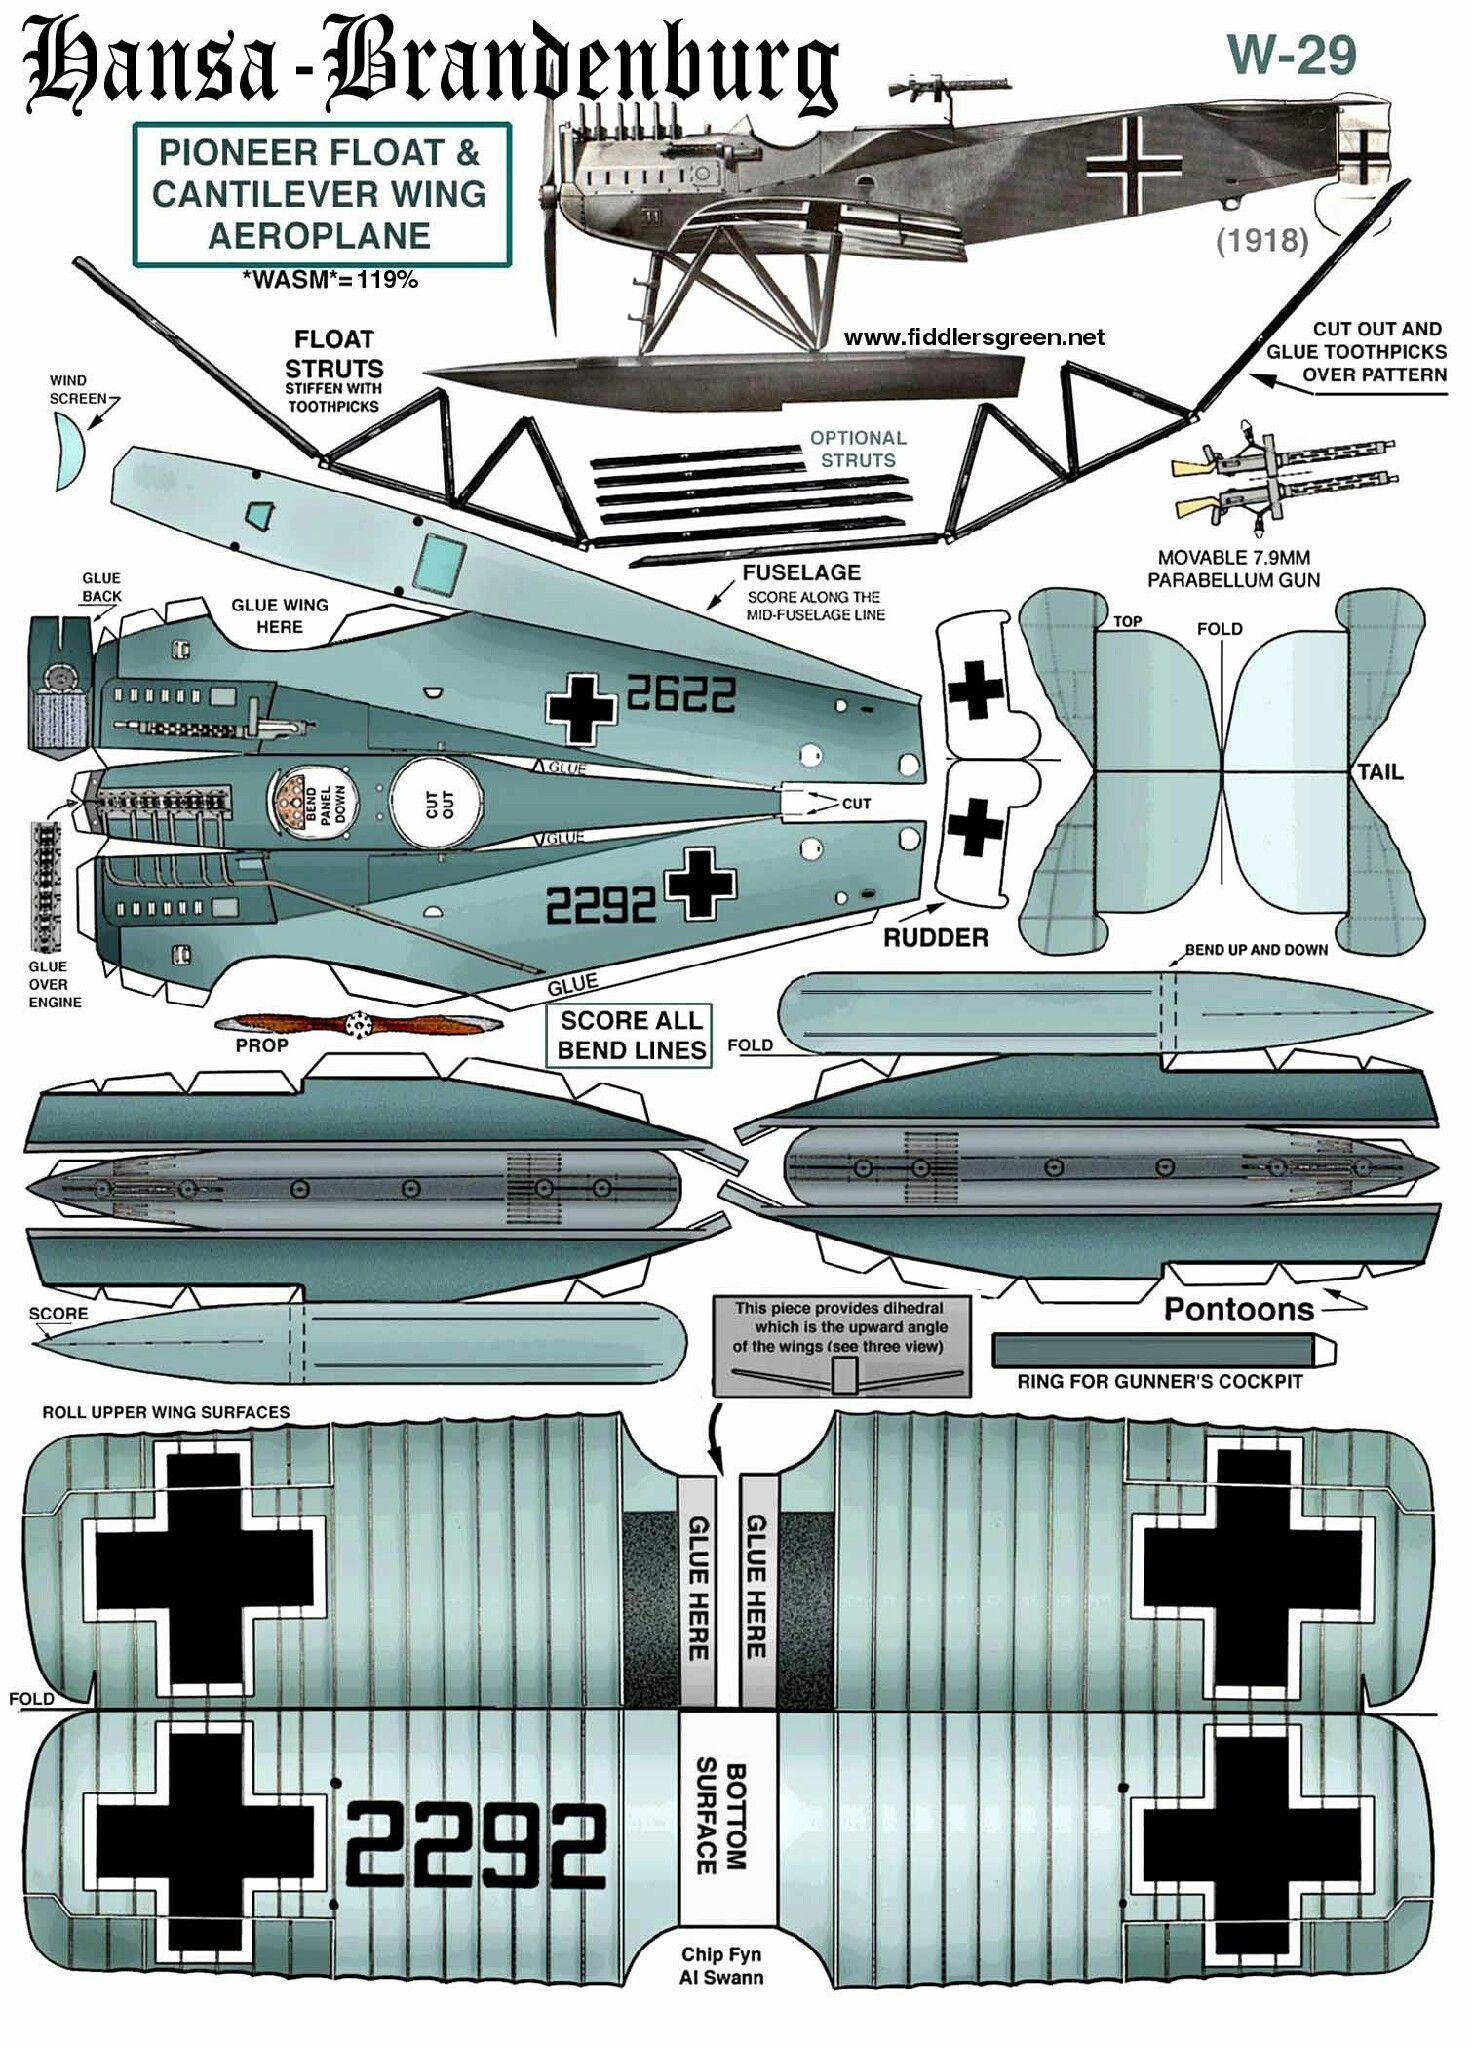 Hansa Brandenburg Aircraft | Hobby: Papercraft | Paper ...